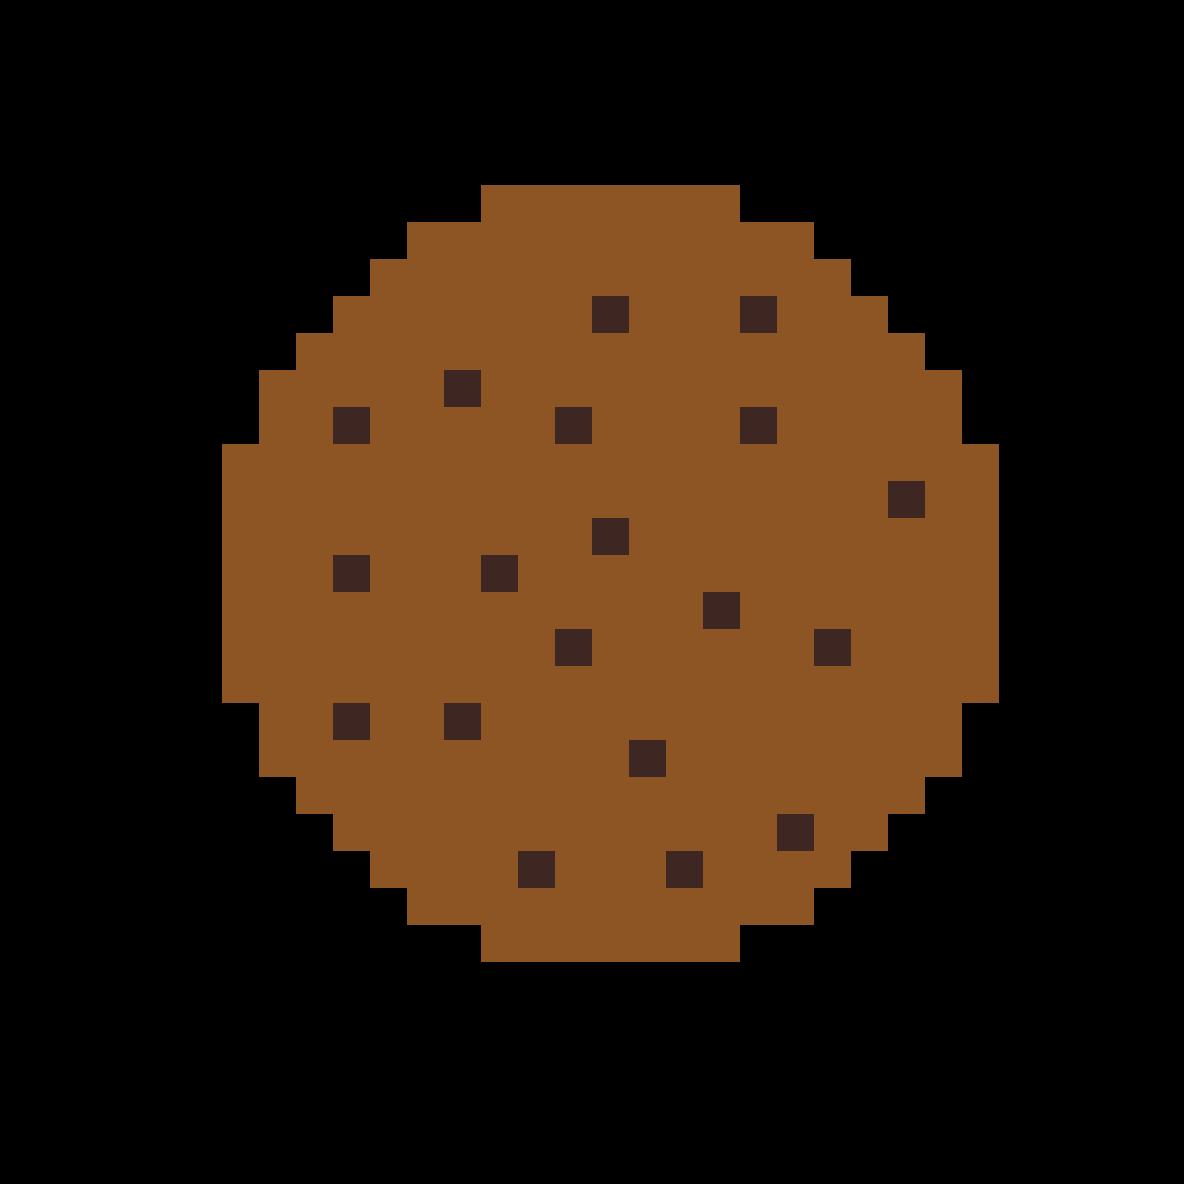 Chocolate Chip Cookie by Rowan39